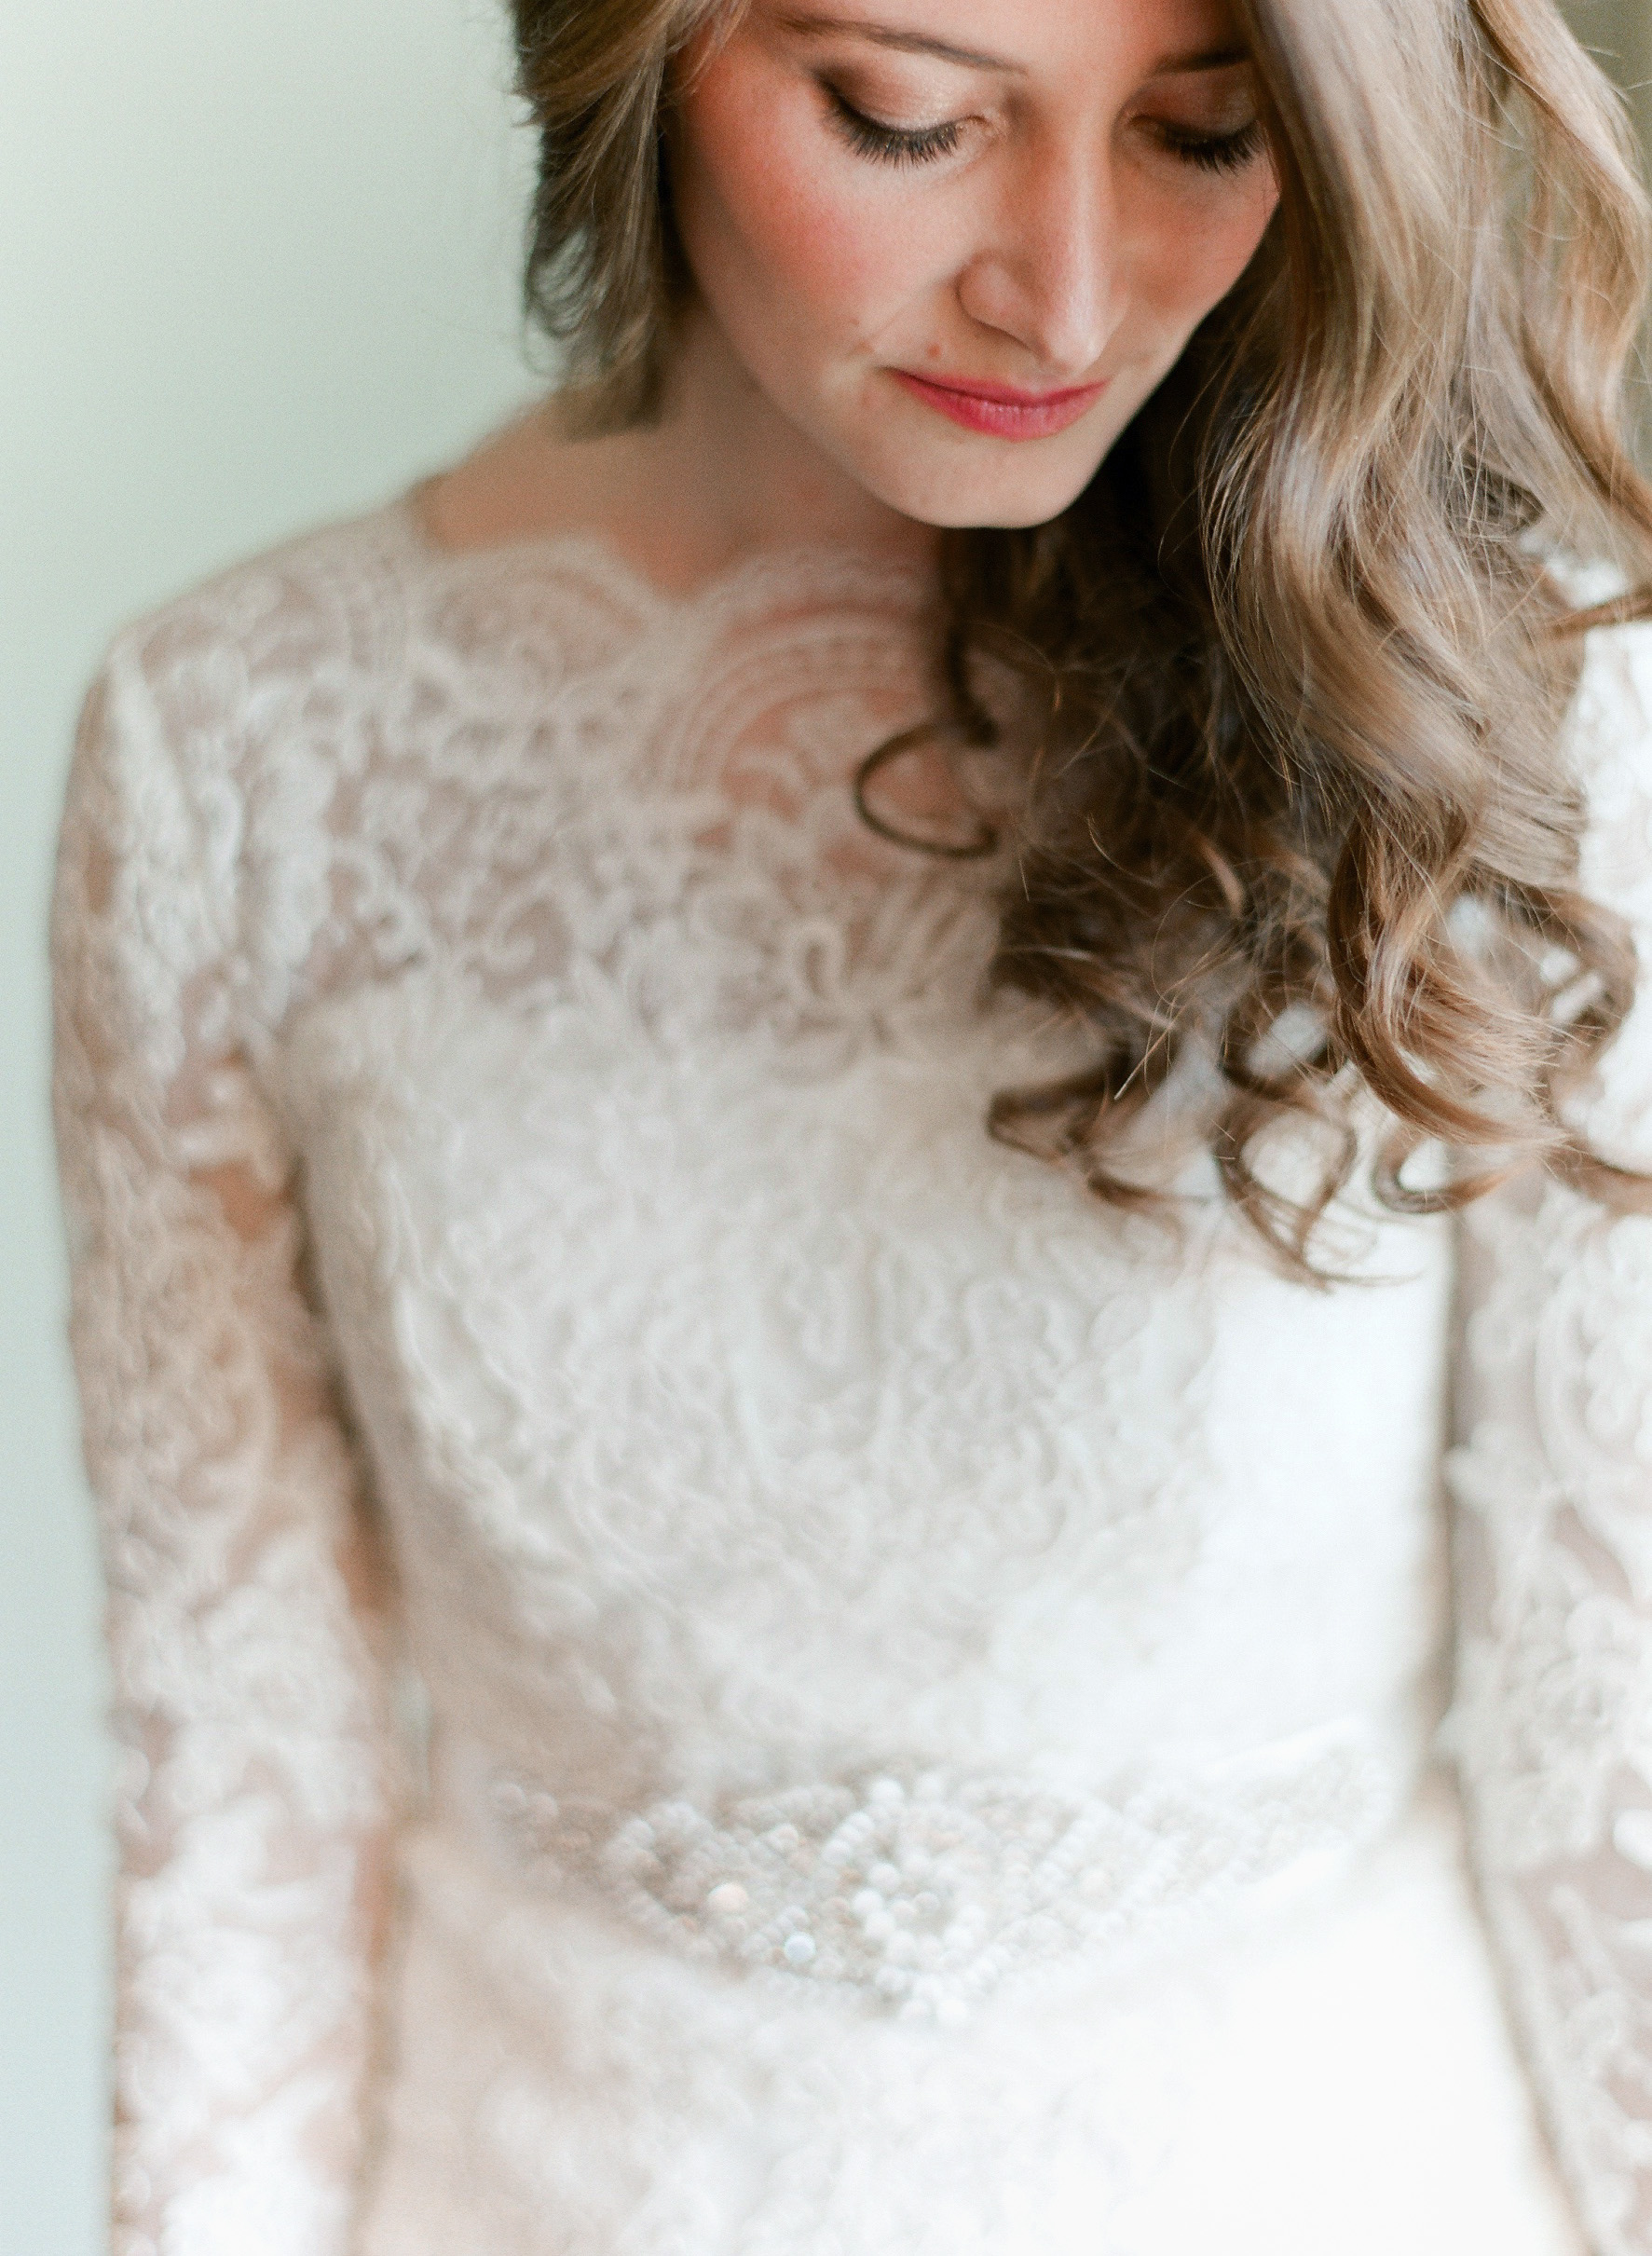 Orthodox Jewish bride gets ready as Top Destination Wedding Photographer photographs her Malibu wedding